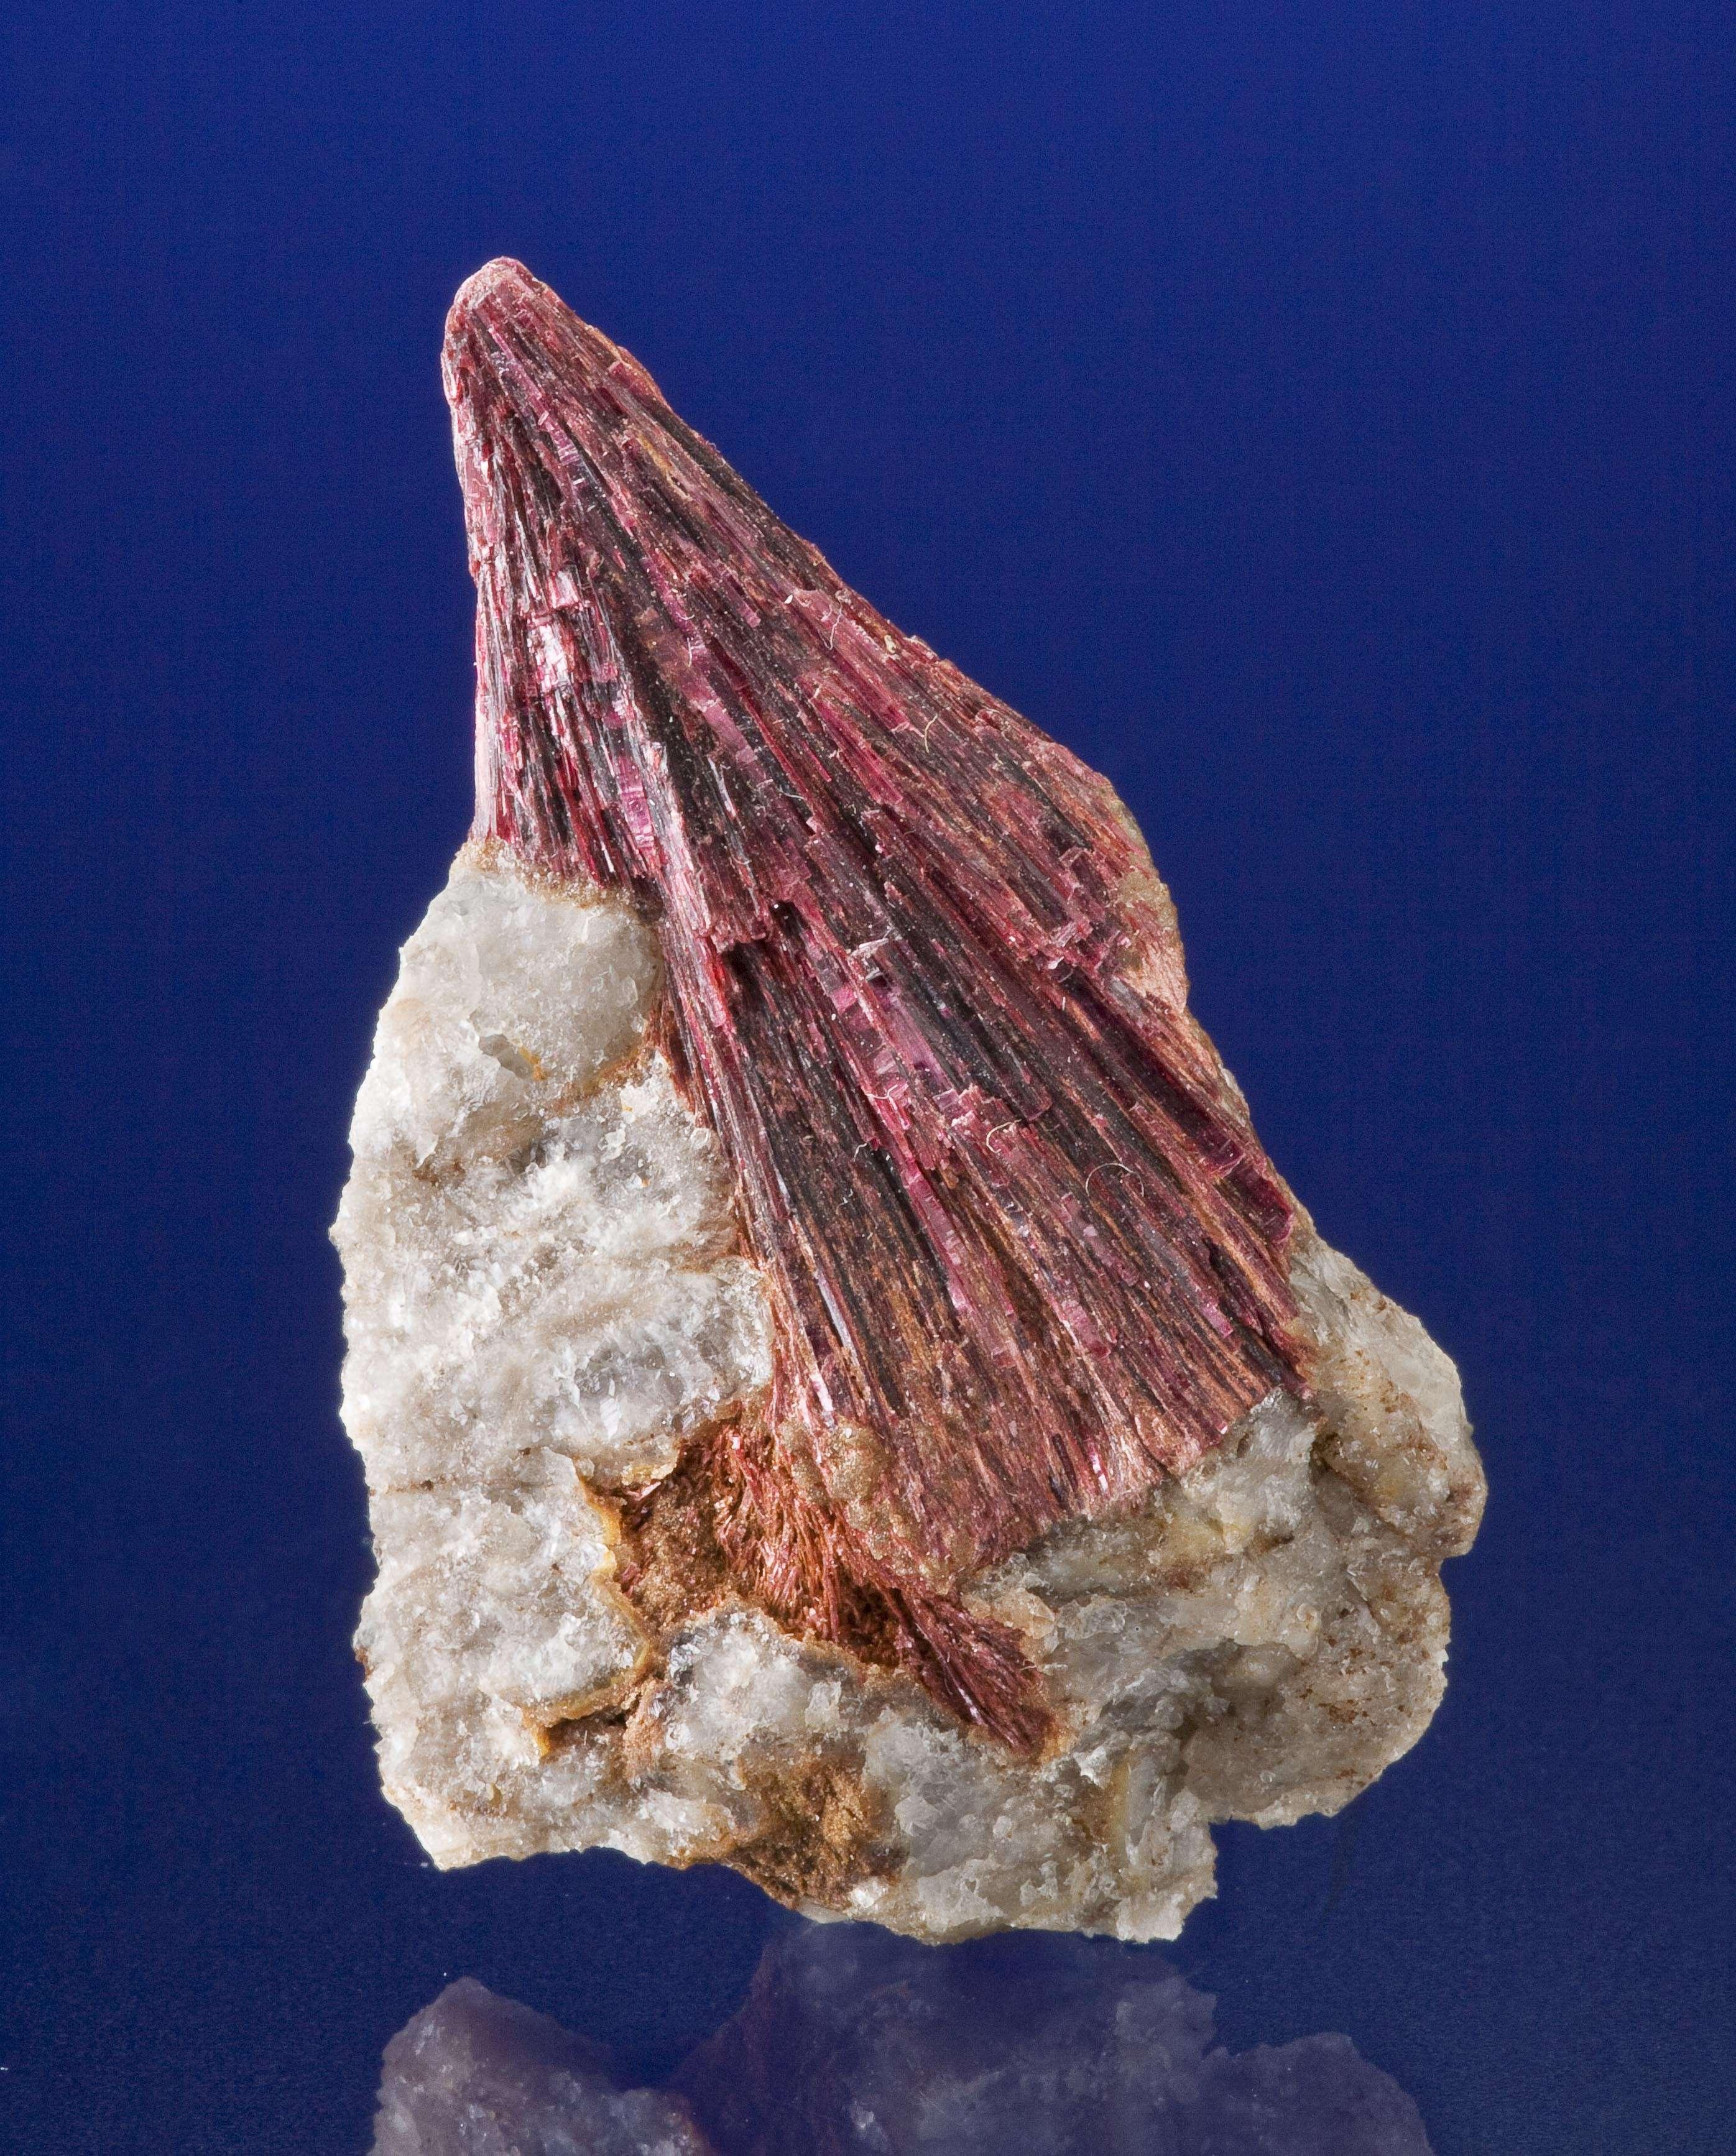 The 4 cm long crystals metallic erythrite rising quartz shard make